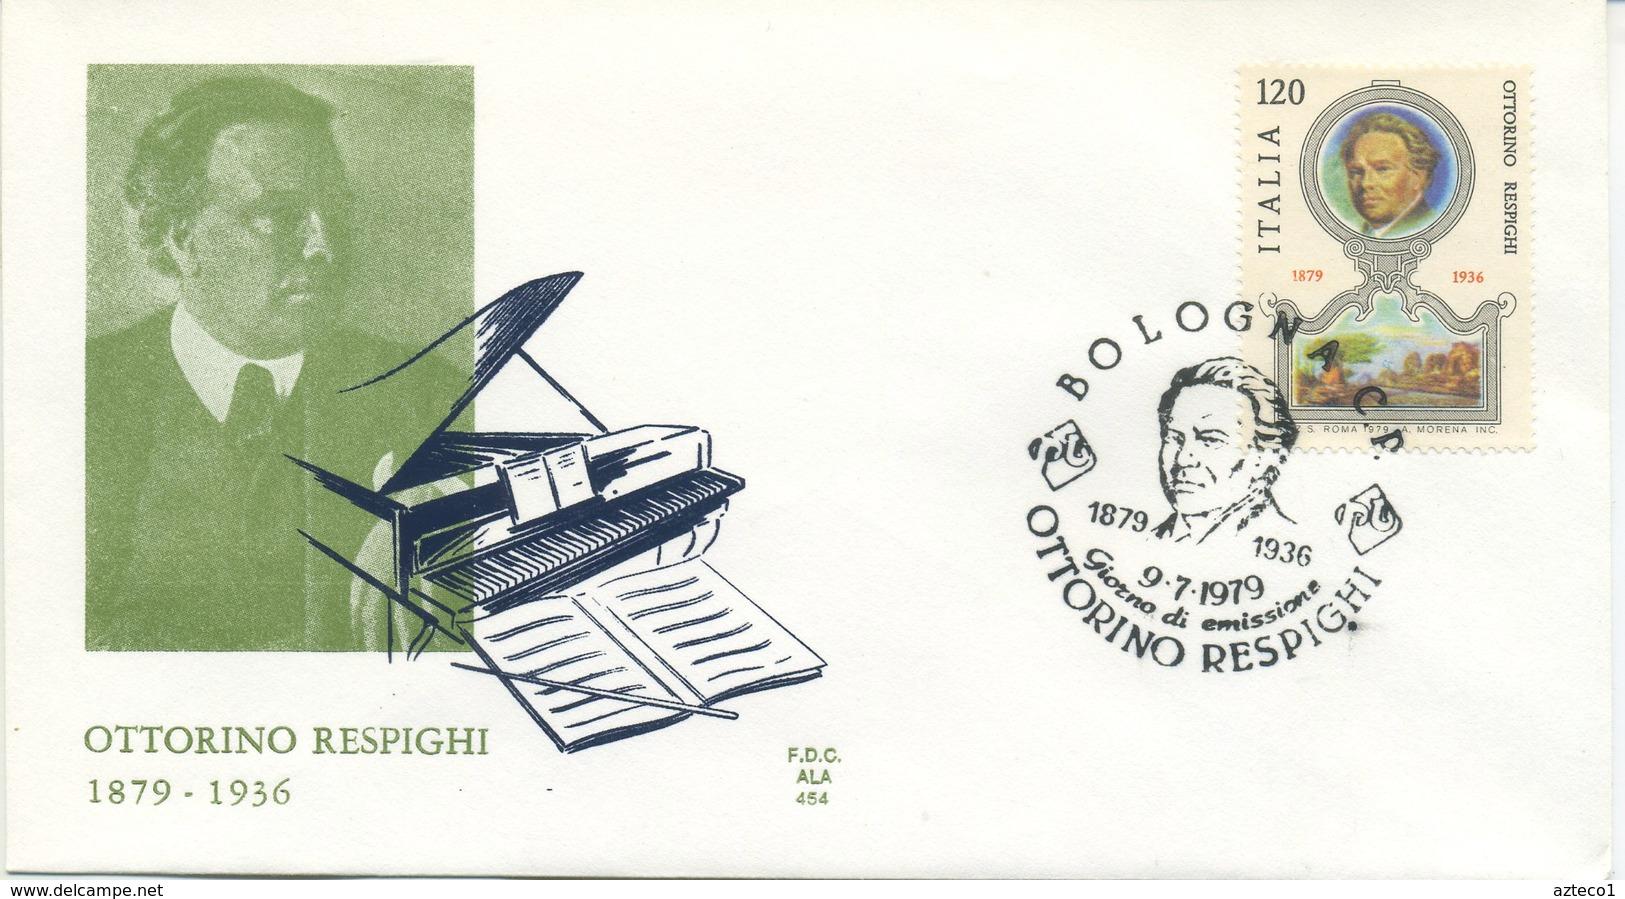 ITALIA - FDC ALA 1979 - OTTORINO RESPIGHI - MUSICA - F.D.C.